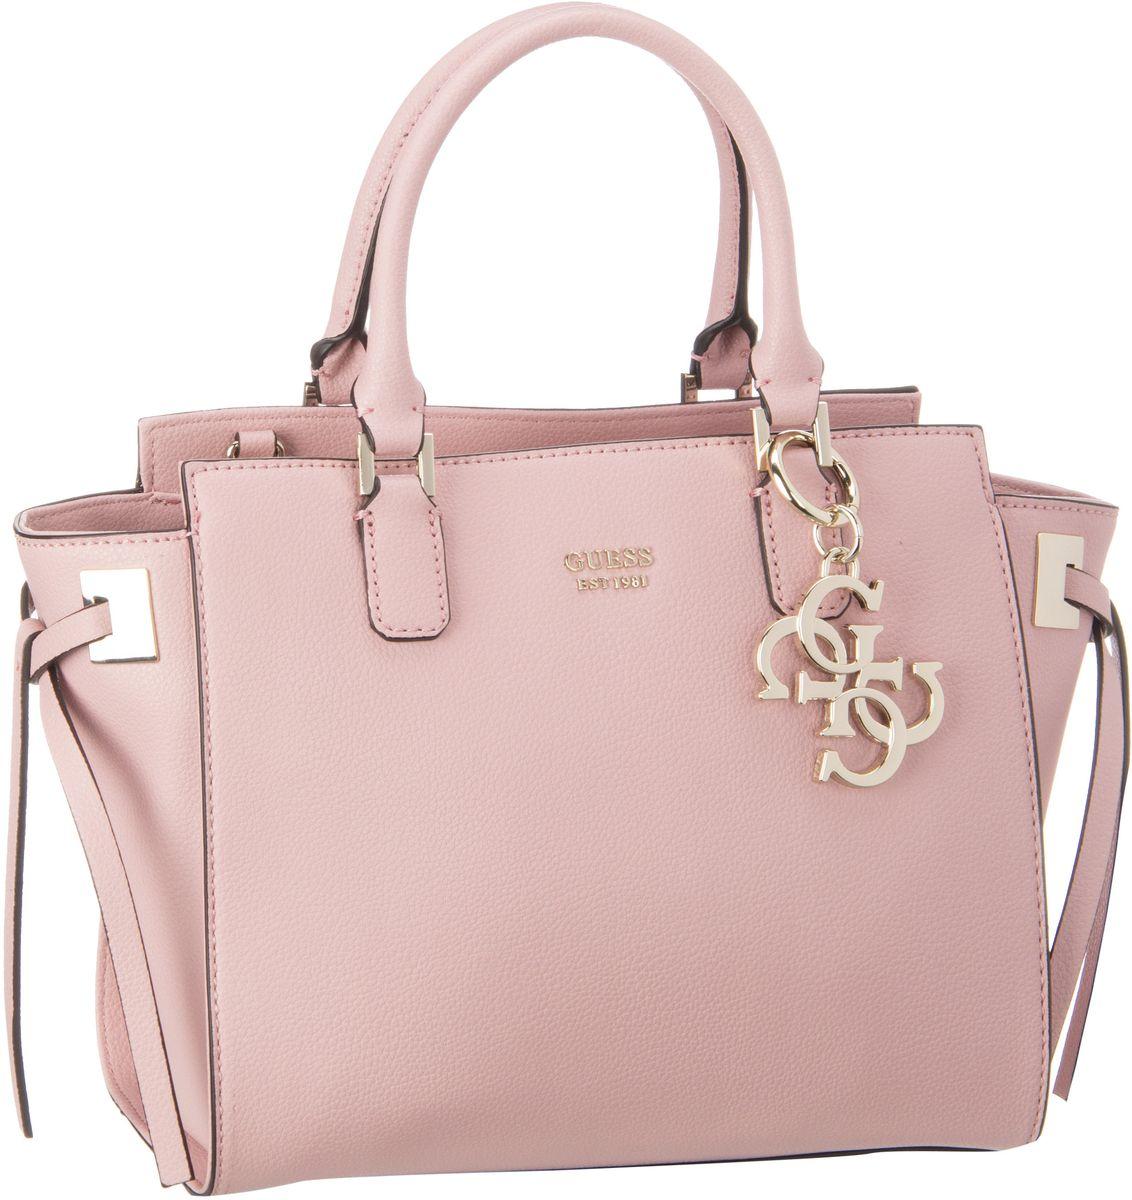 Guess Digital Status Satchel Pink - Handtasche